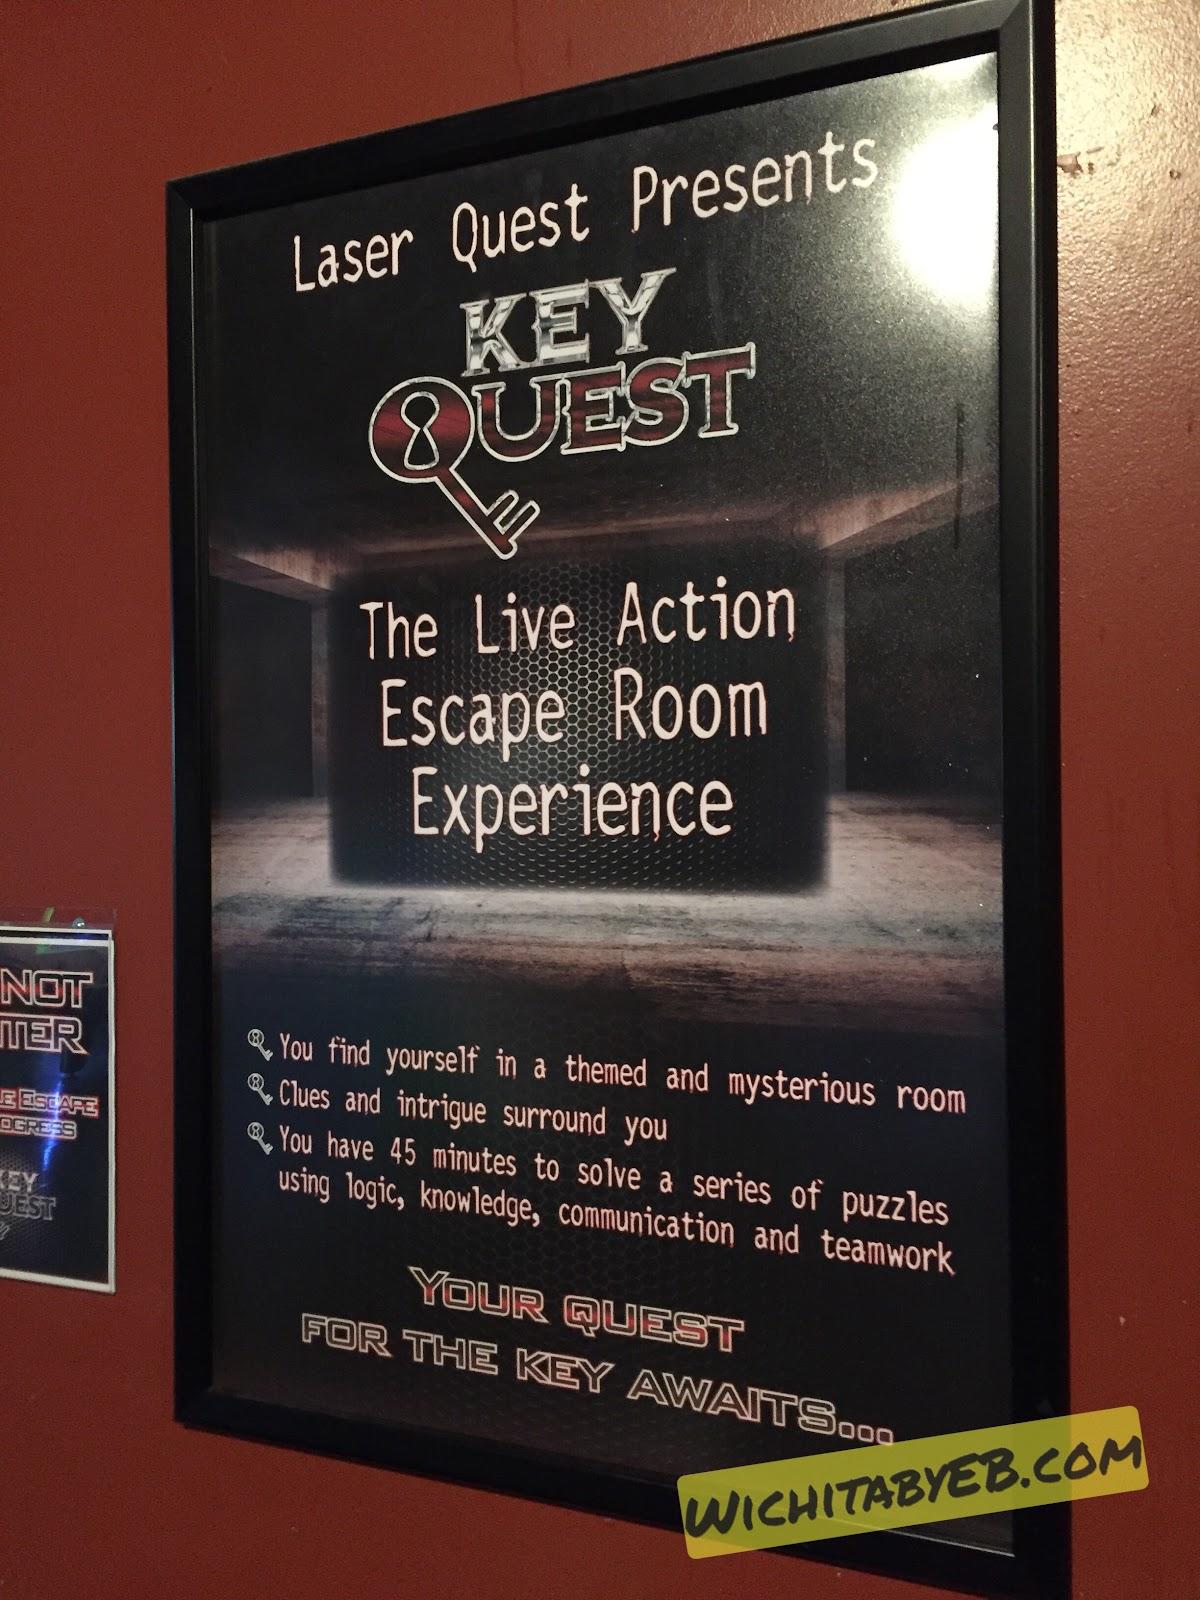 Key quest escape room wichita wichita by eb key quest solutioingenieria Images